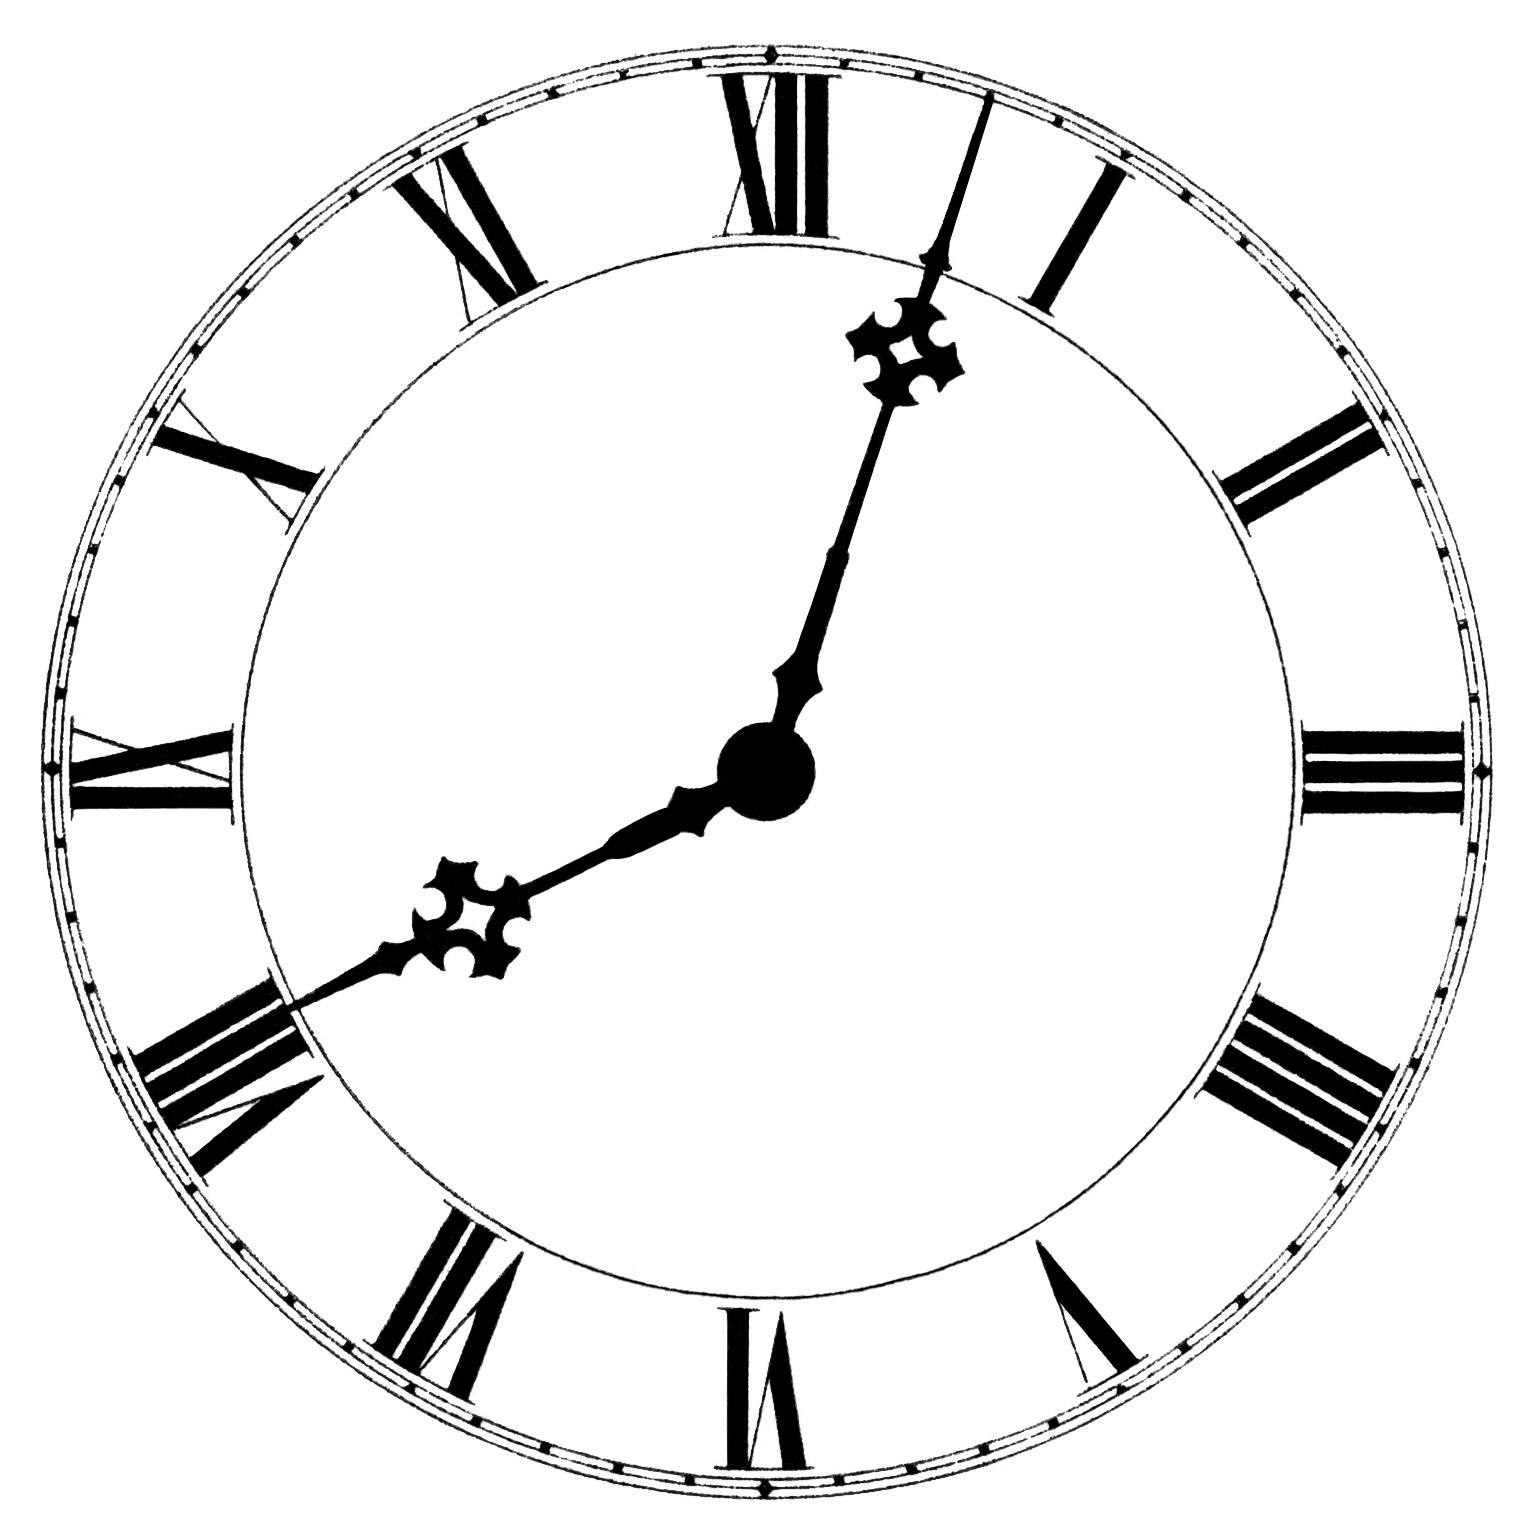 vintage school clip art, roman numeral clock graphics, old catalog ad ...